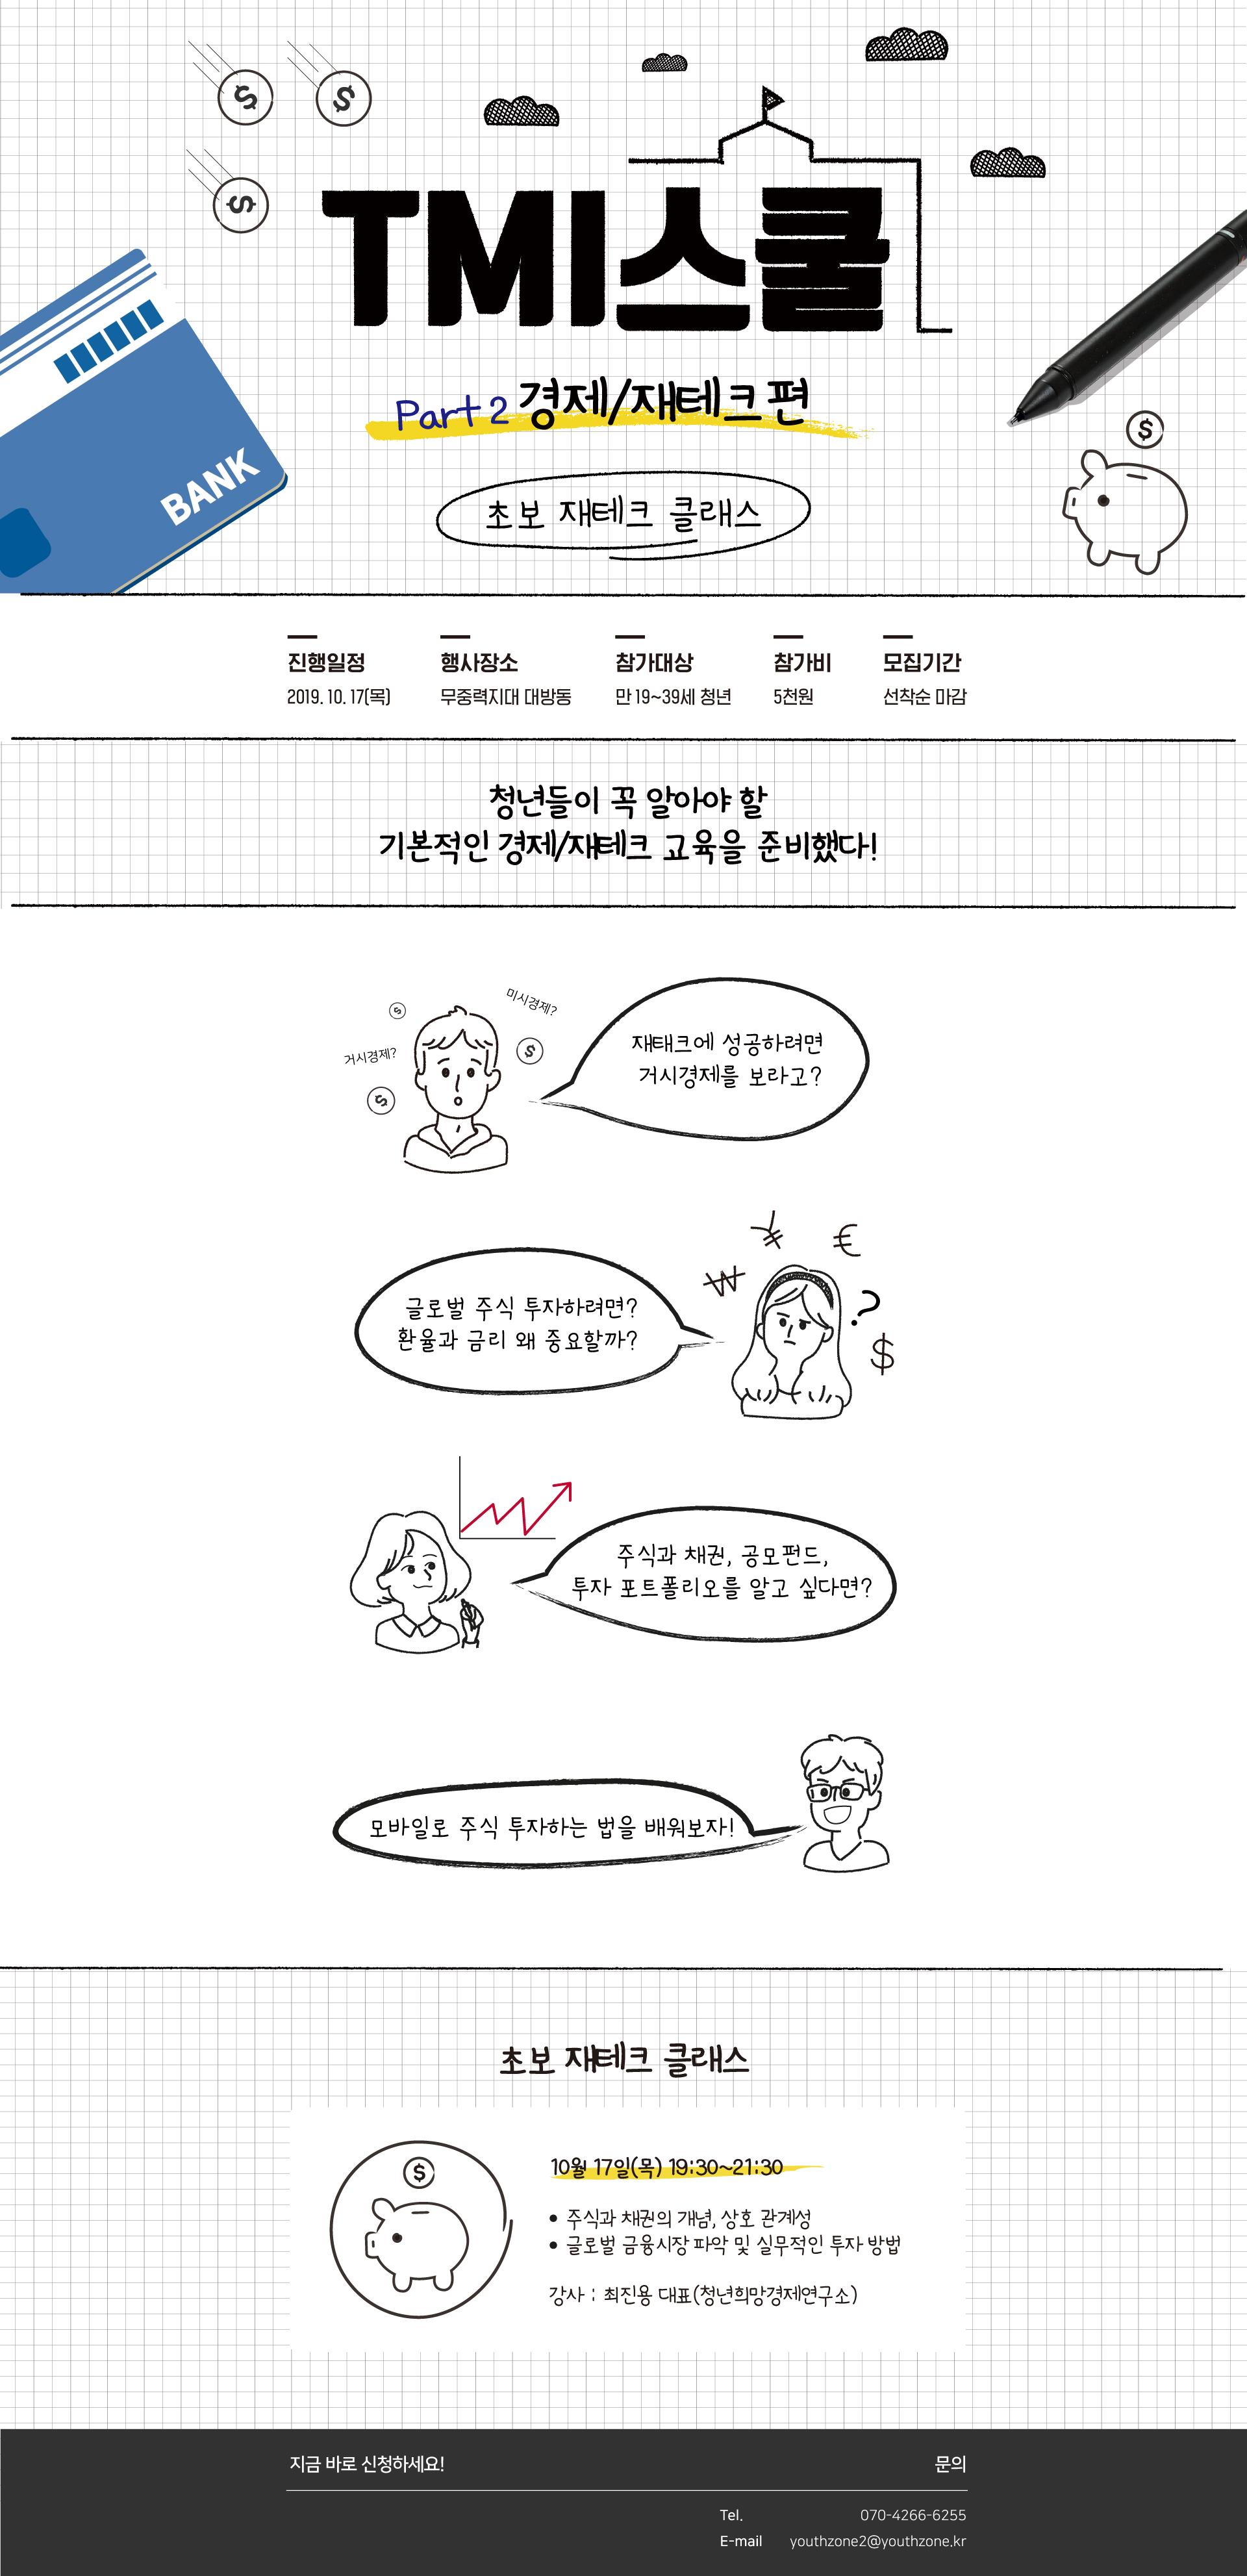 TMI스쿨 part2. 경제/재테크편_초보 재테크 클래스, 참가자 모집!